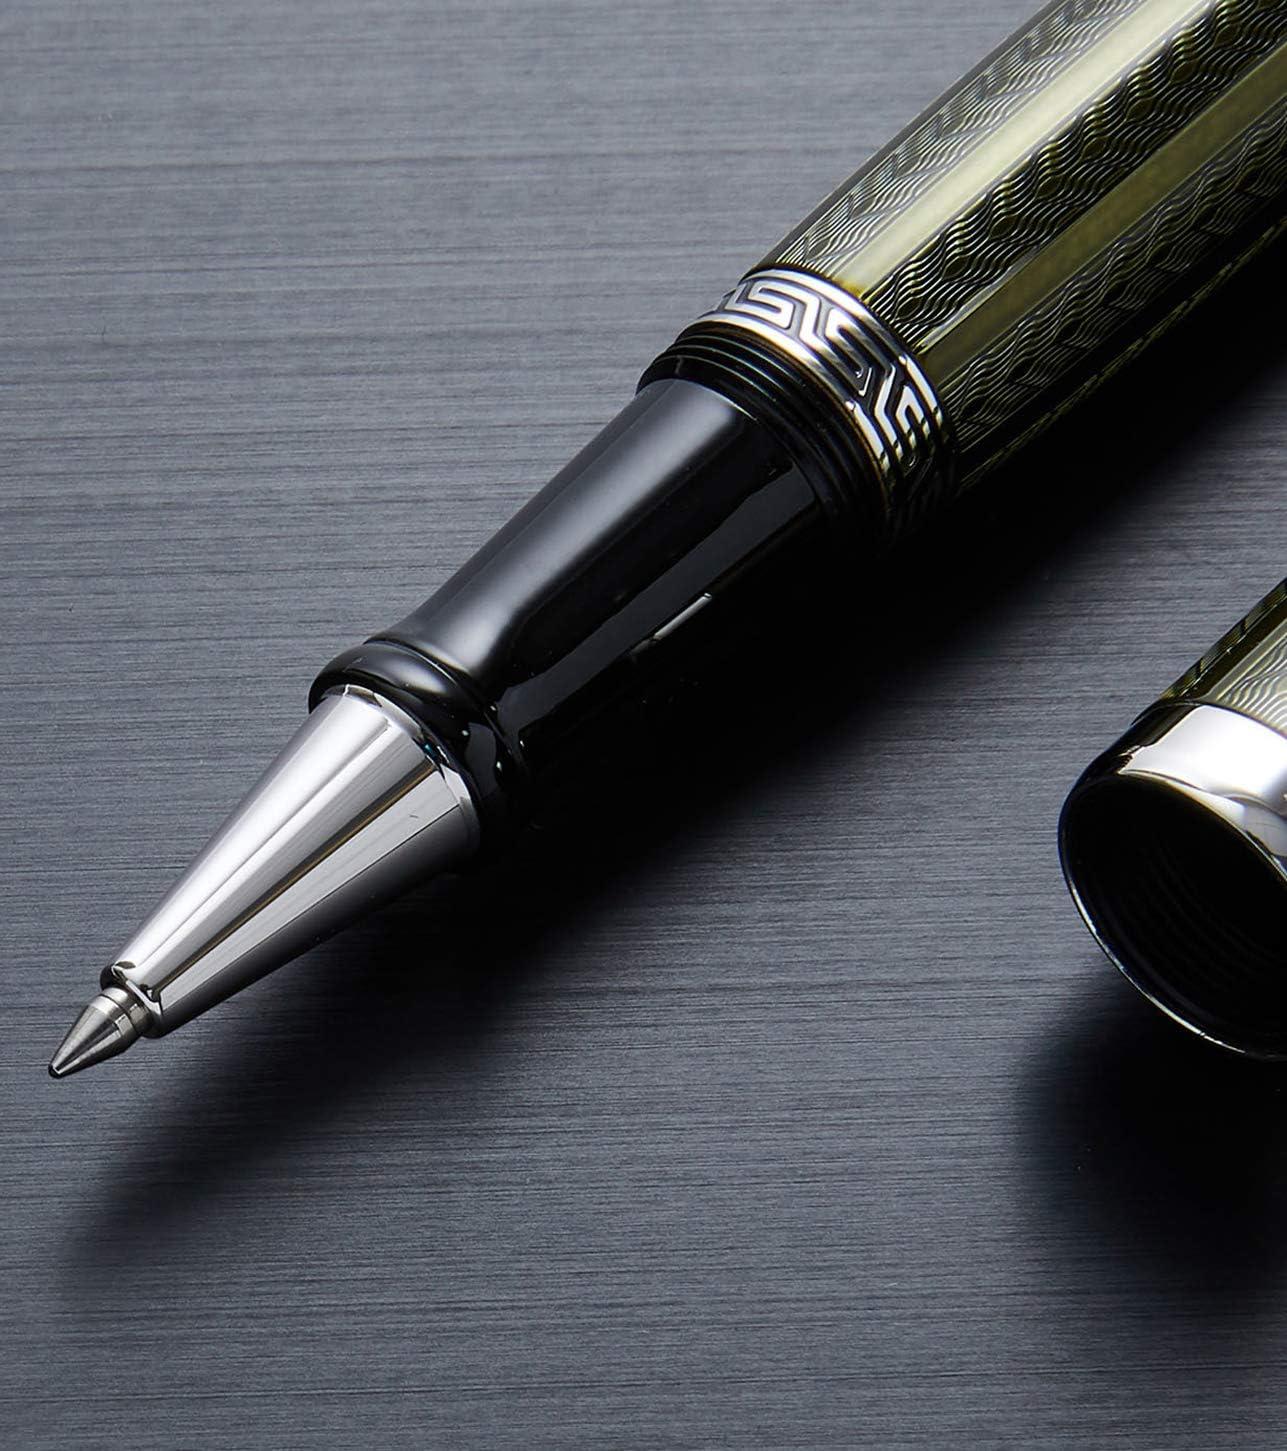 couleur tanzanite Length posted-158 mm; dia-13 mm; weight-62 grams Moldavite Xezo Maestro LeGrand Stylo /à bille fine plaqu/é platine